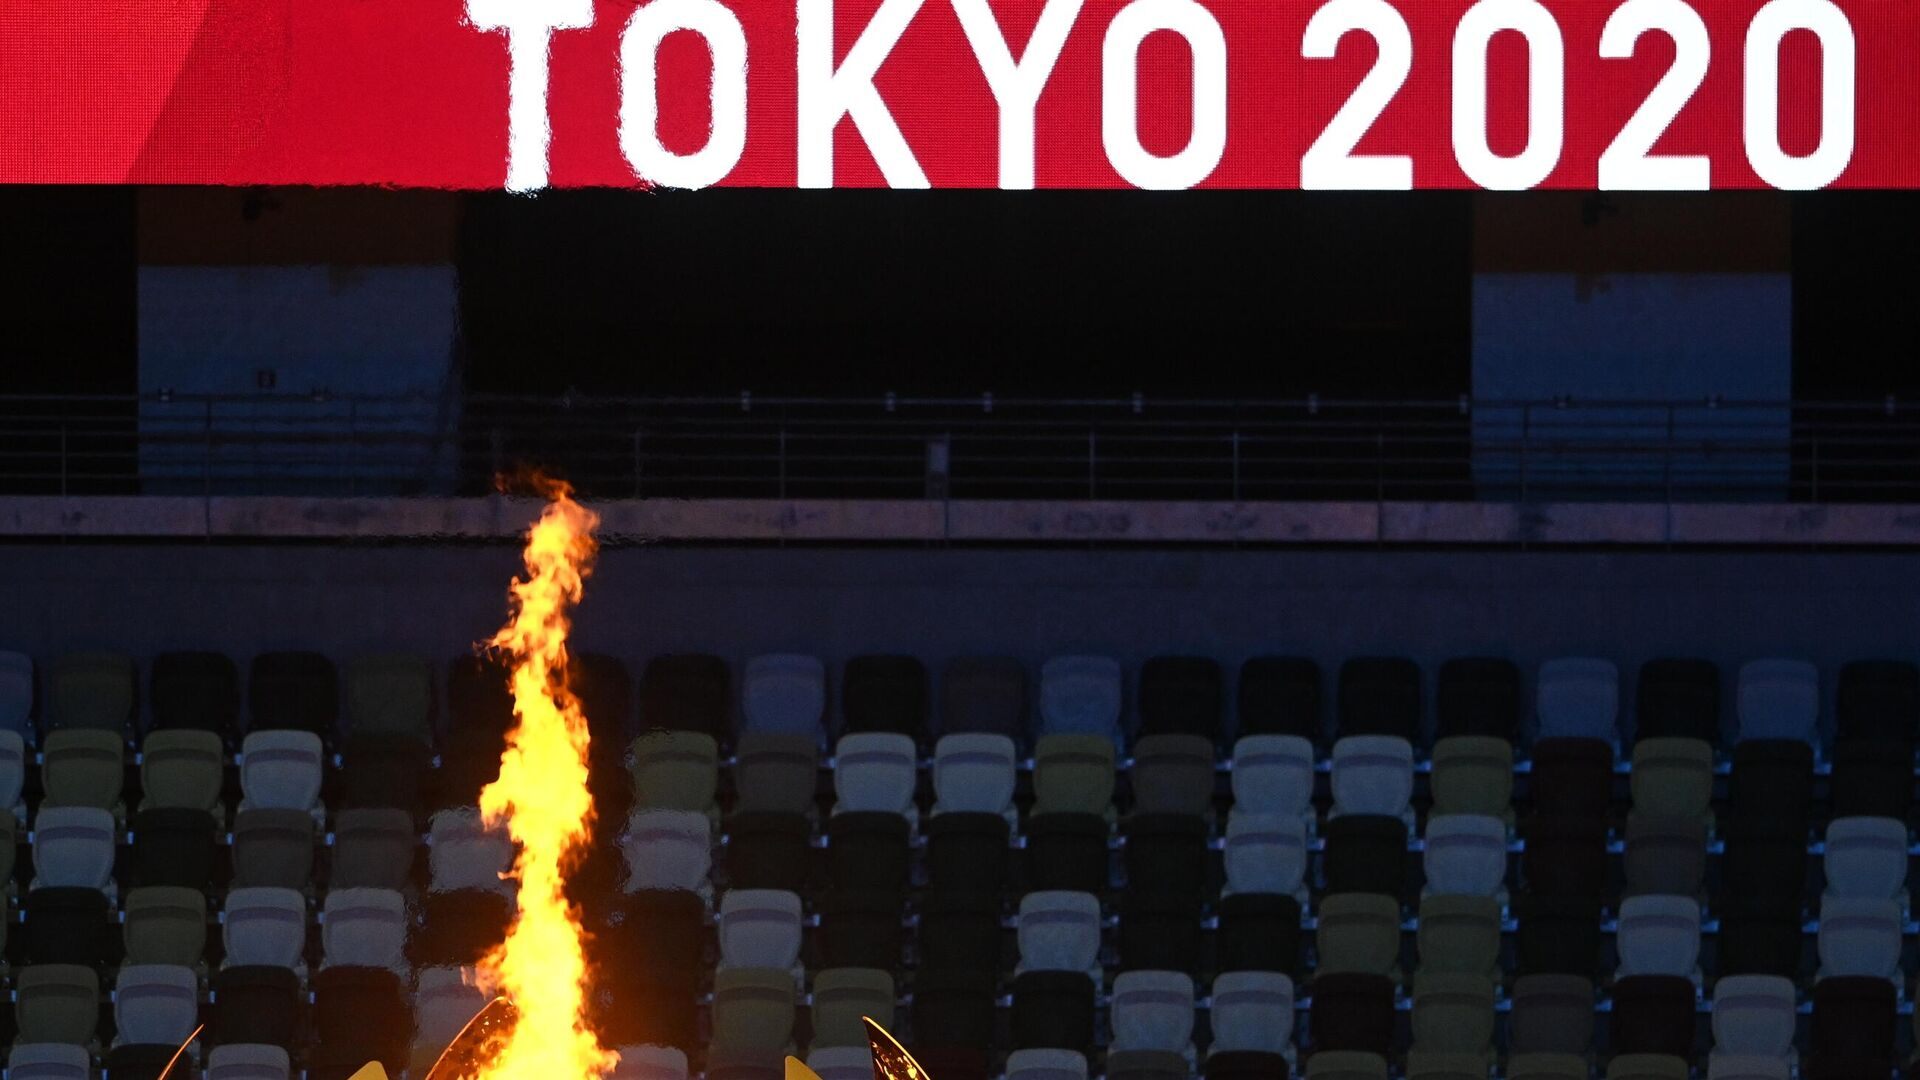 Japan Olympics 2020 Opening Ceremony - РИА Новости, 1920, 23.07.2021